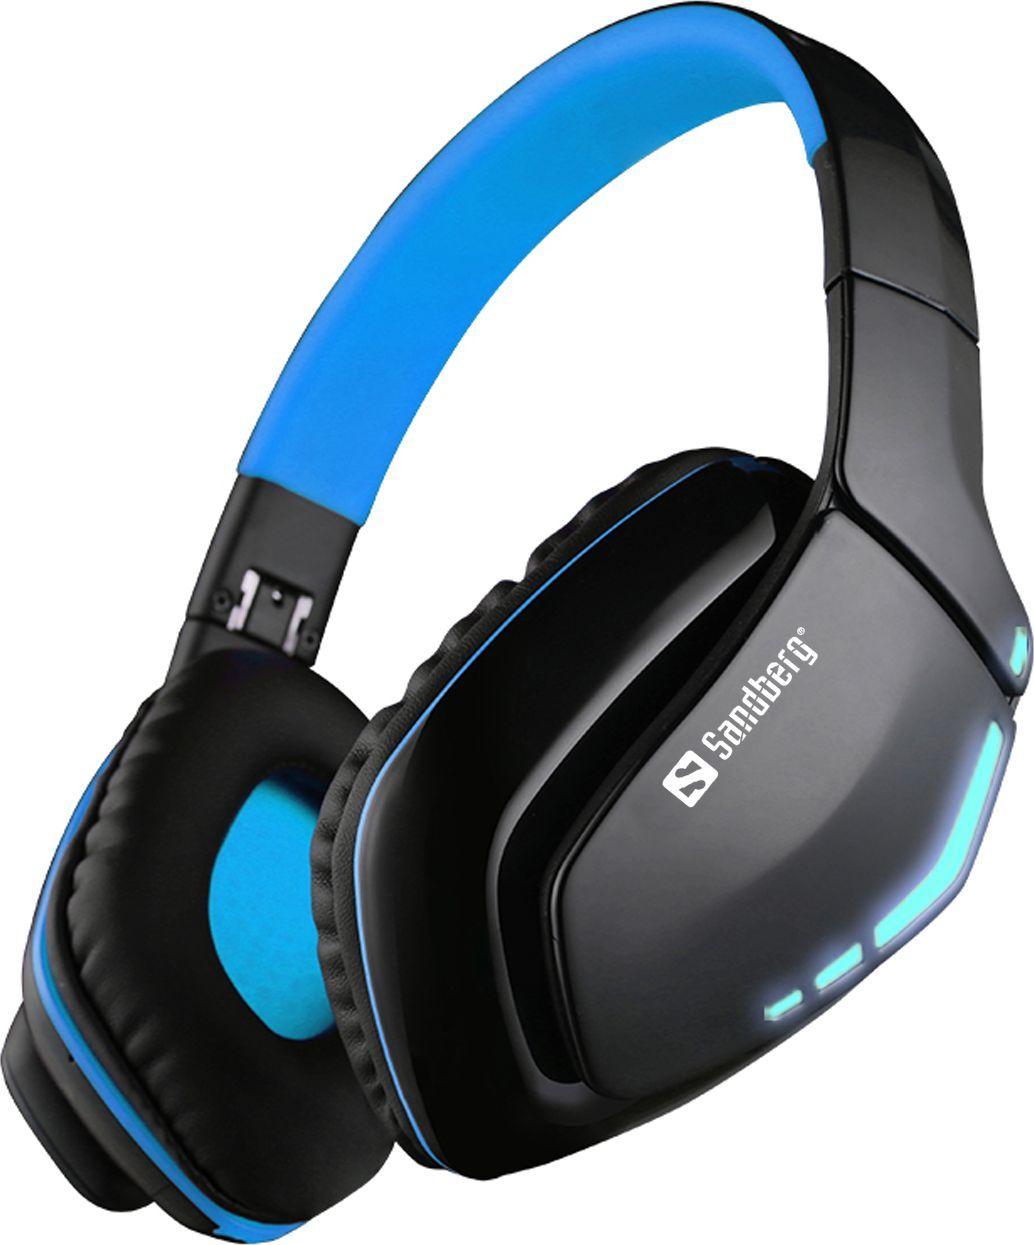 Słuchawki Sandberg Blue Storm (126-01) 1